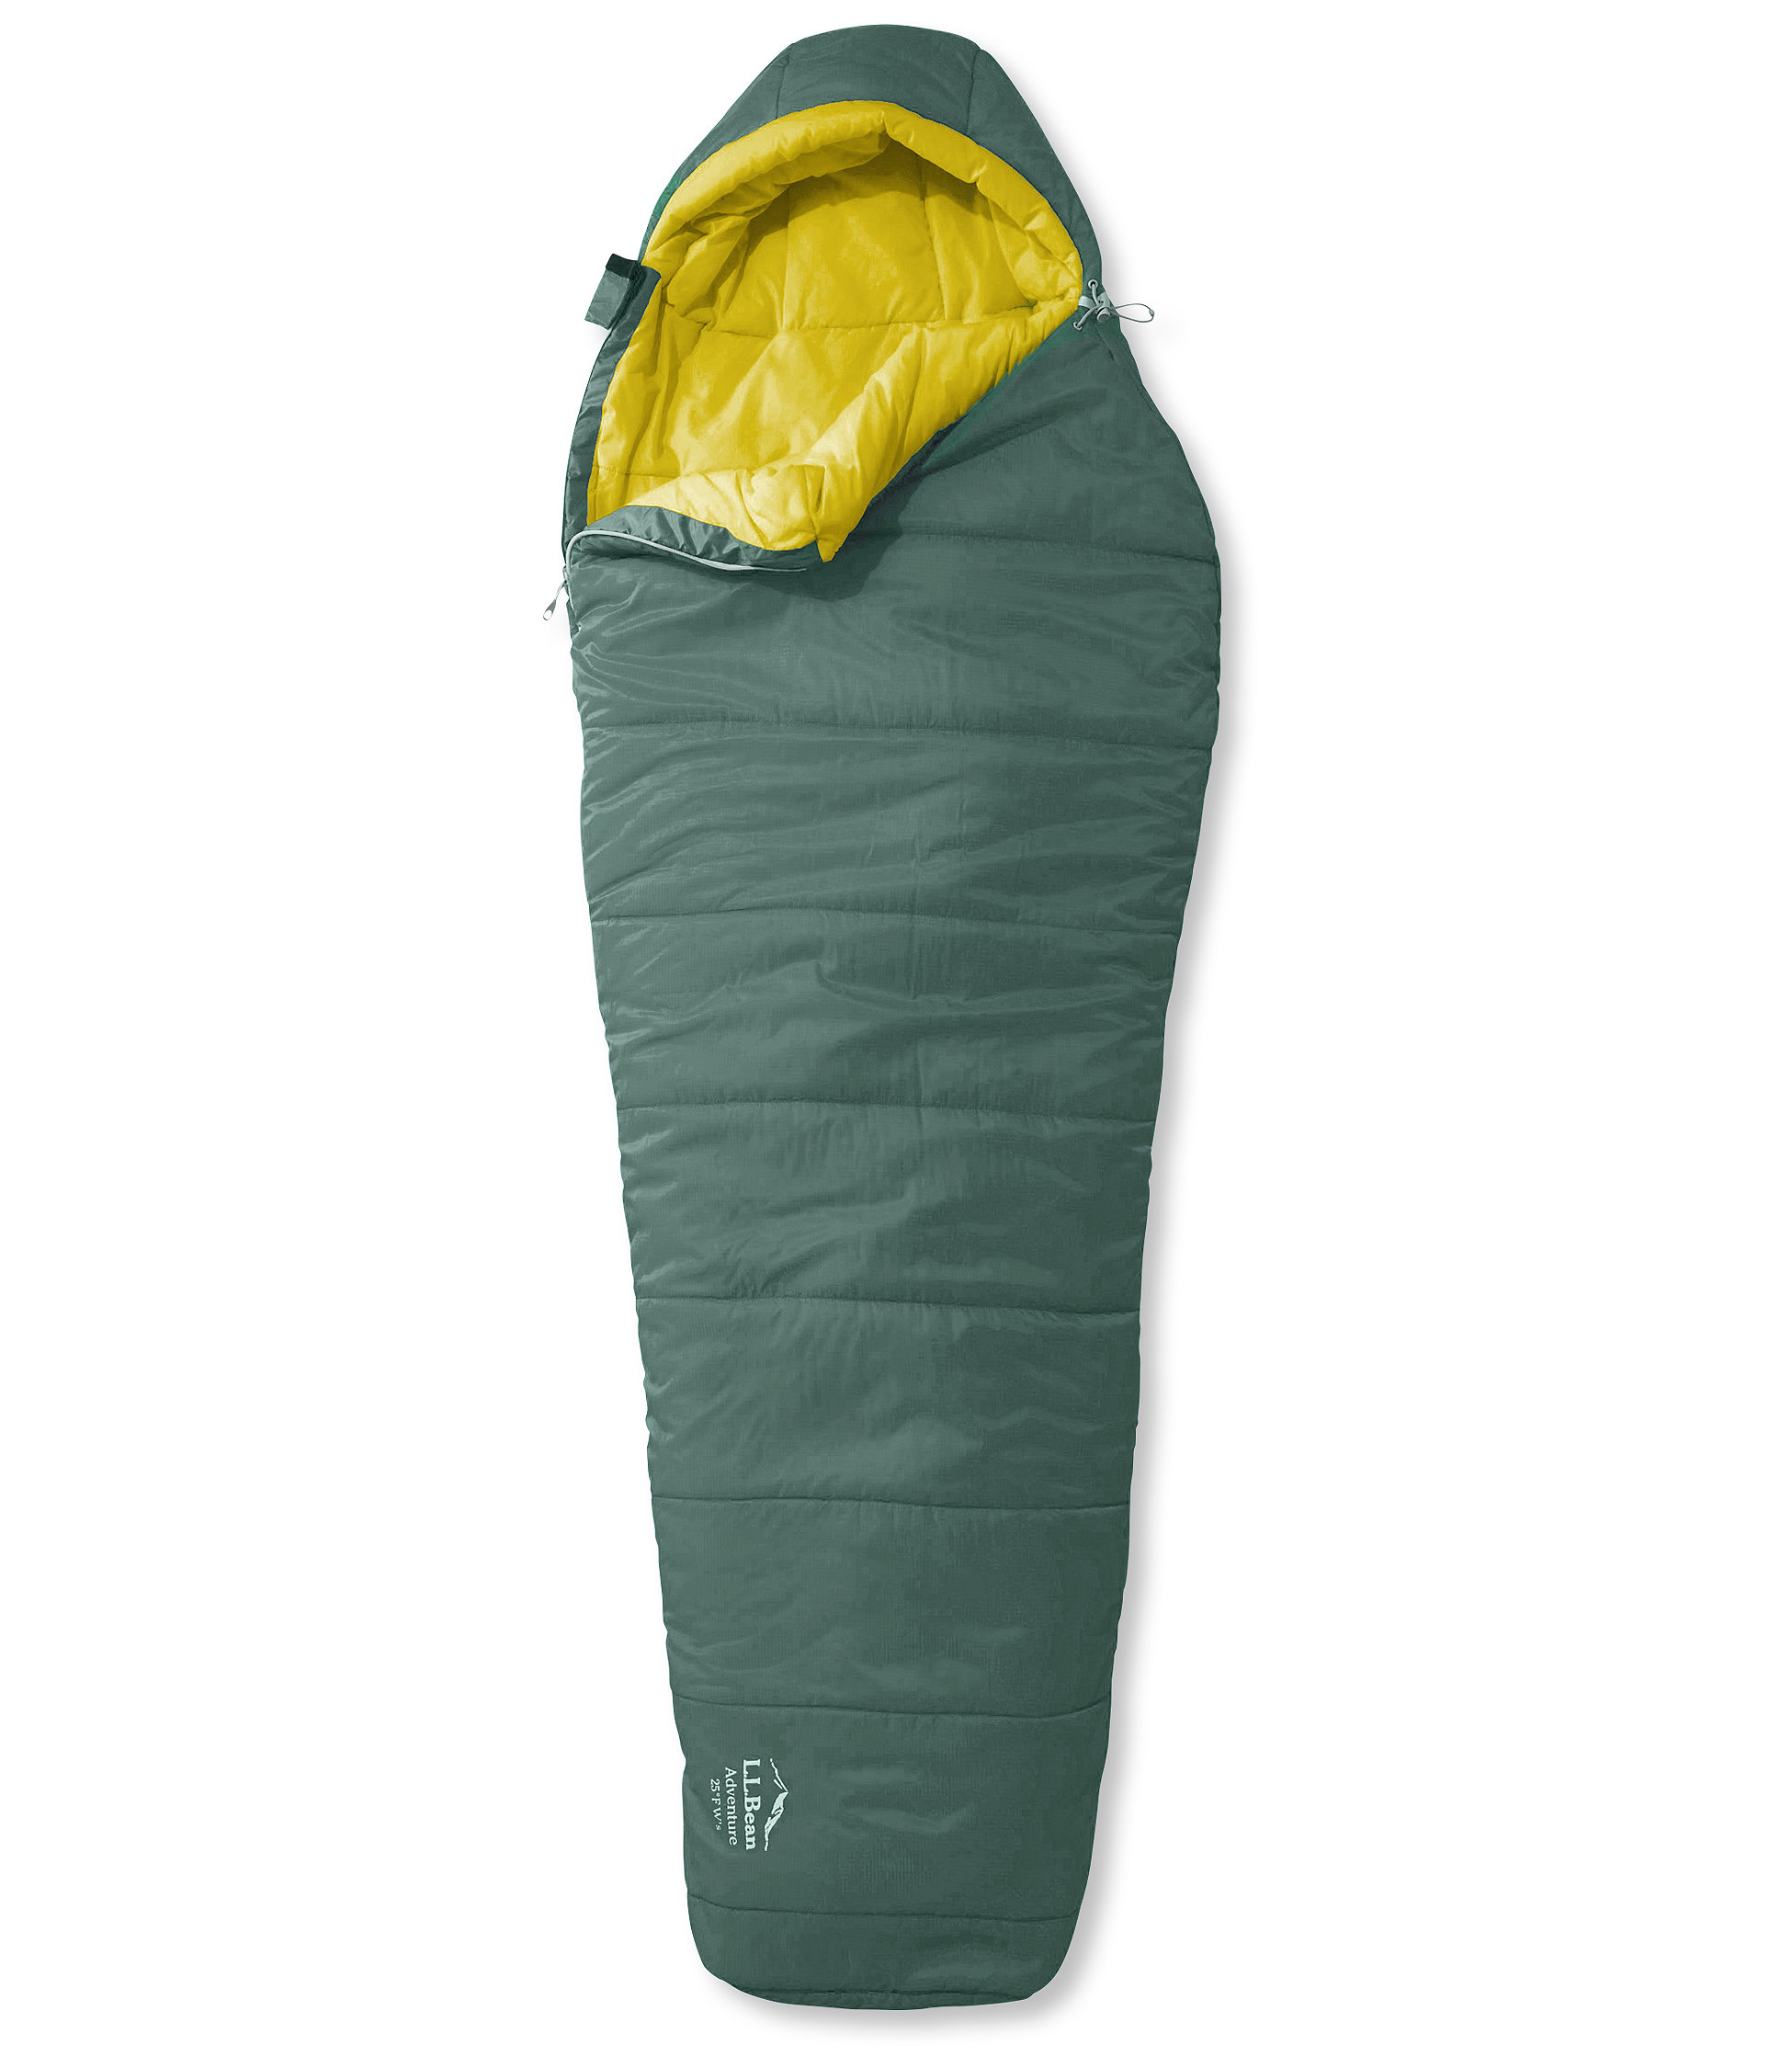 L.L.Bean Adventure Sleeping Bag, Mummy 25